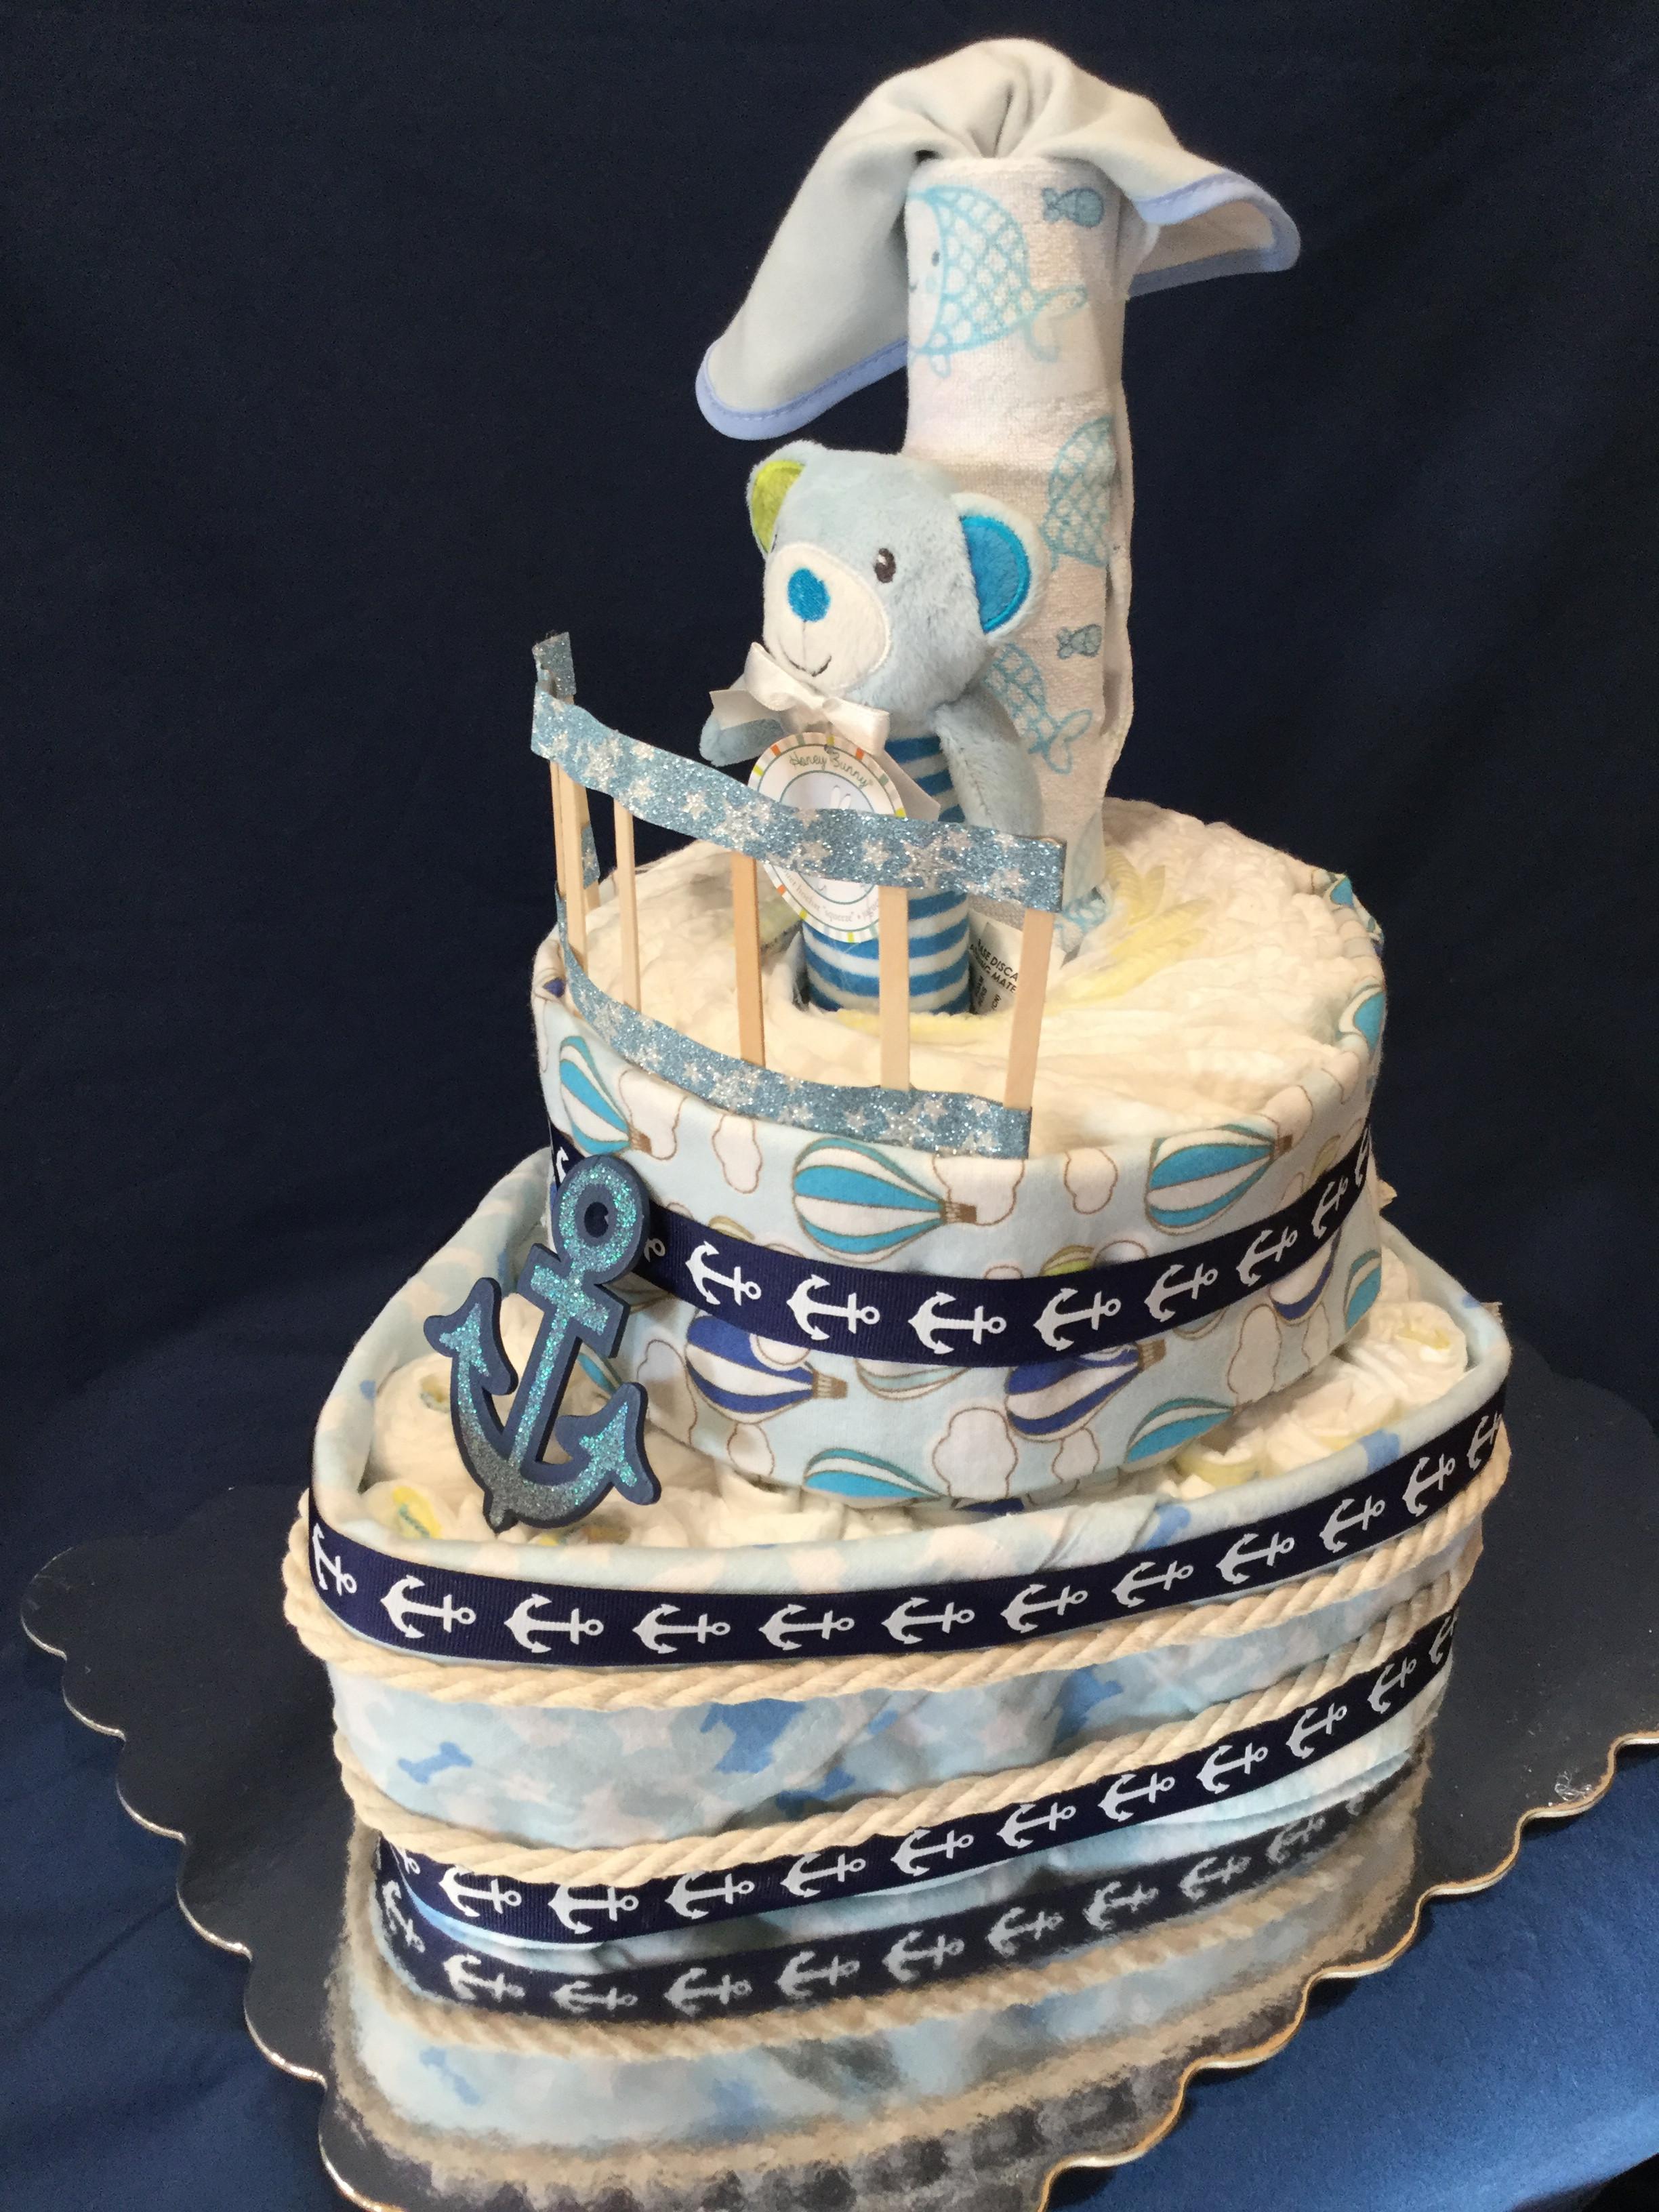 Baby Shower Cadeau Futur Maman baby shower original gifts | baybay kreations